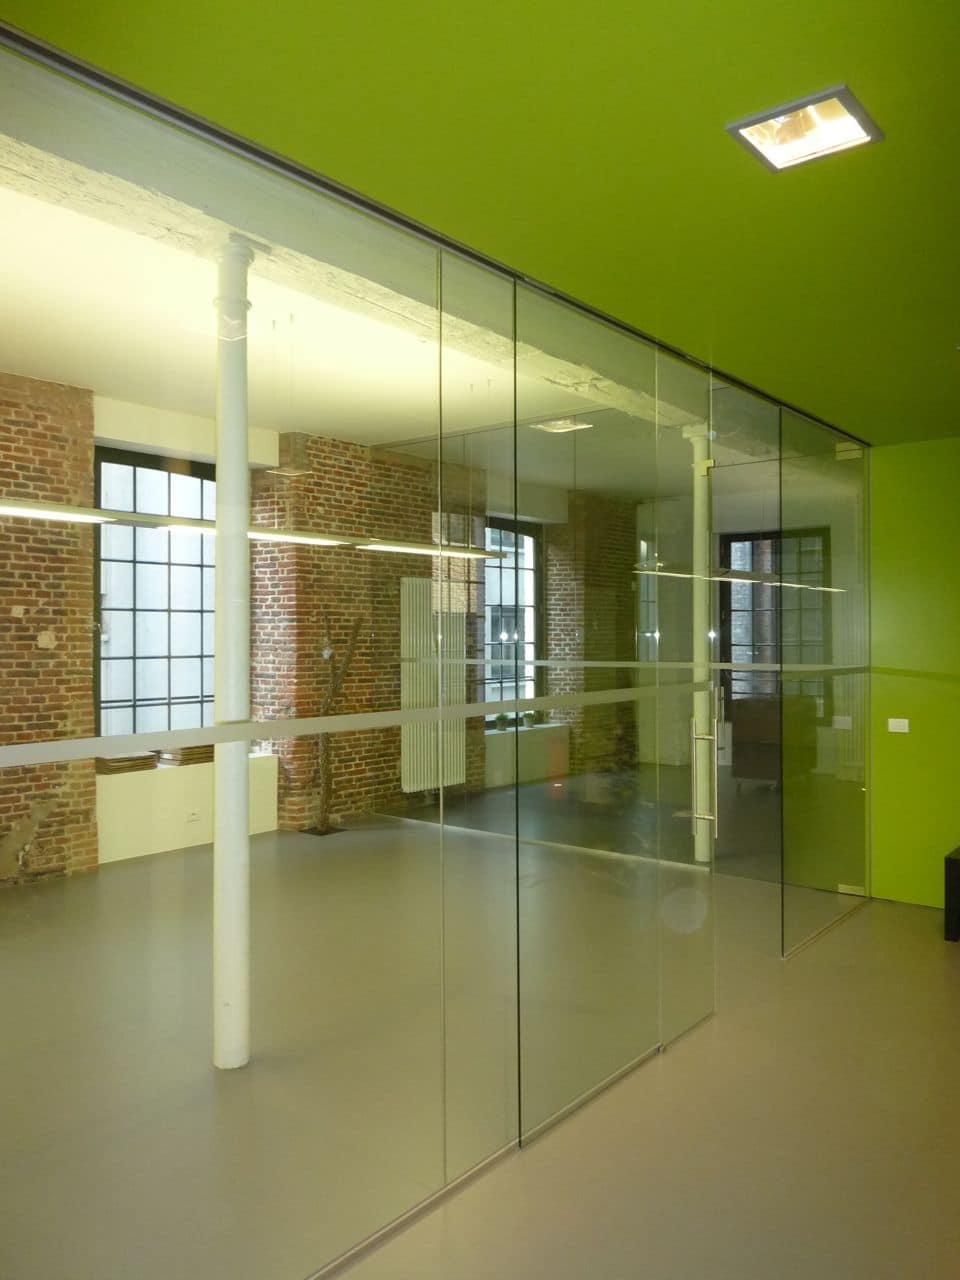 P1060761 | Baeyens & Beck architecten Gent | architect nieuwbouw renovatie interieur | high end | architectenbureau